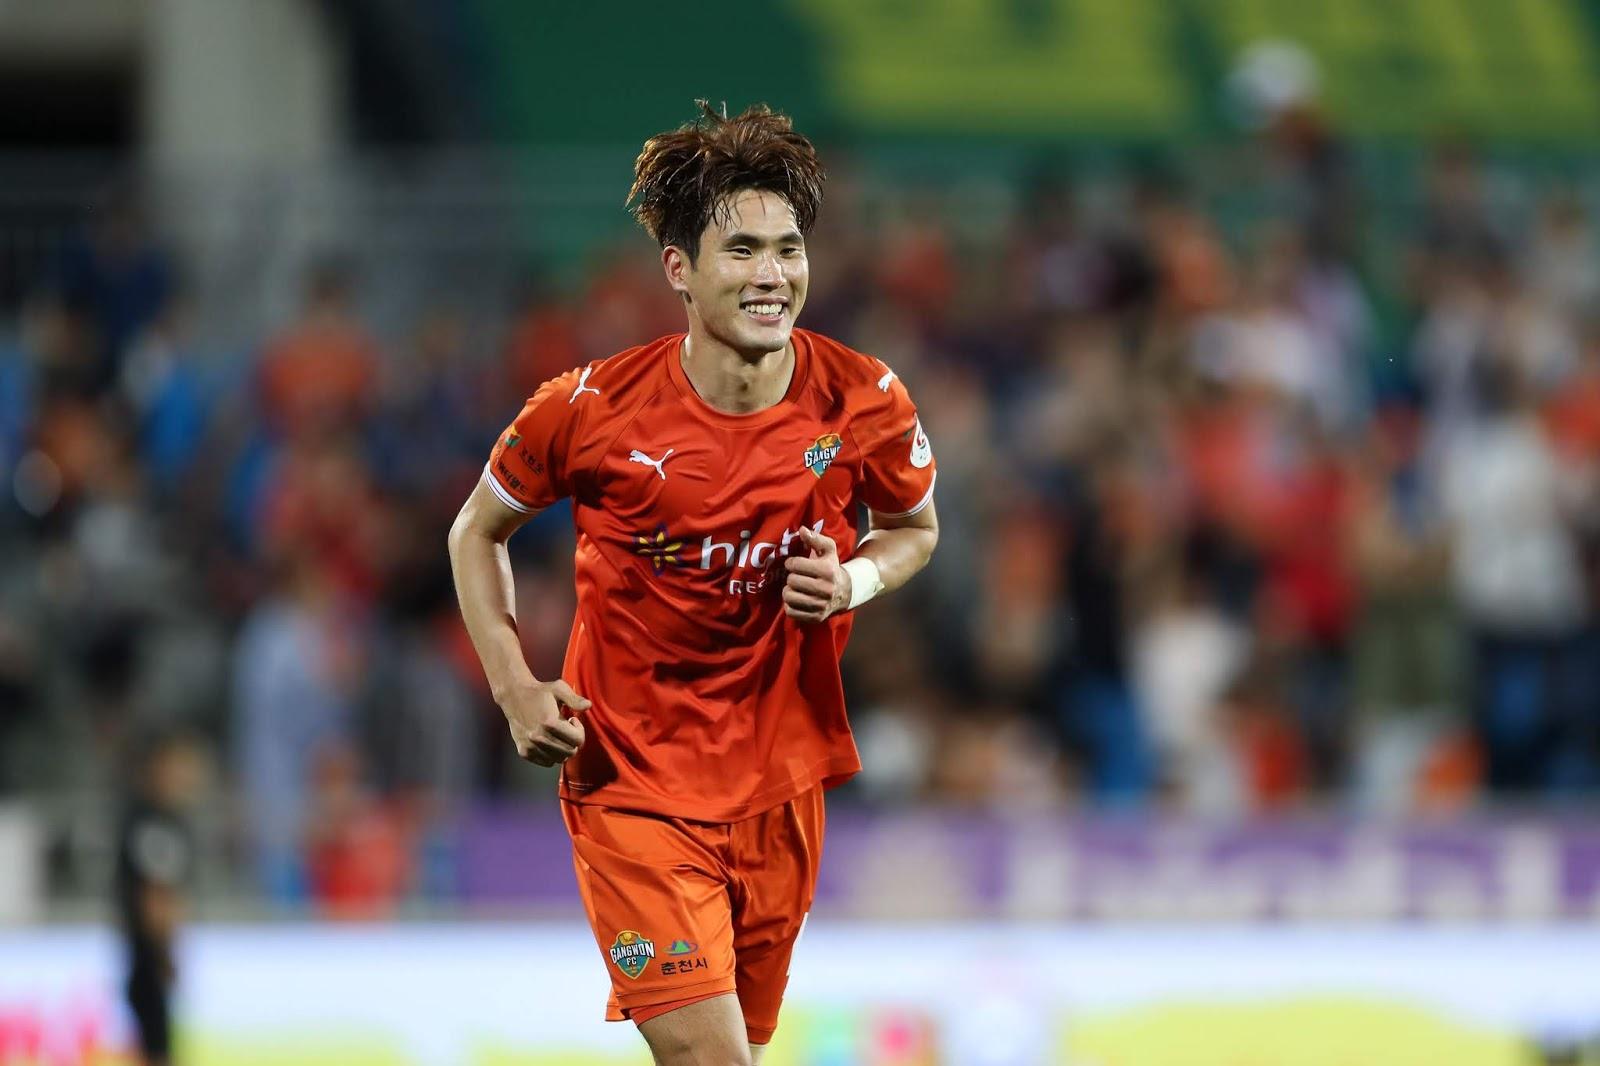 Gangwon FC 2-0 Gyeongnam FC, K League 1 09.01.19